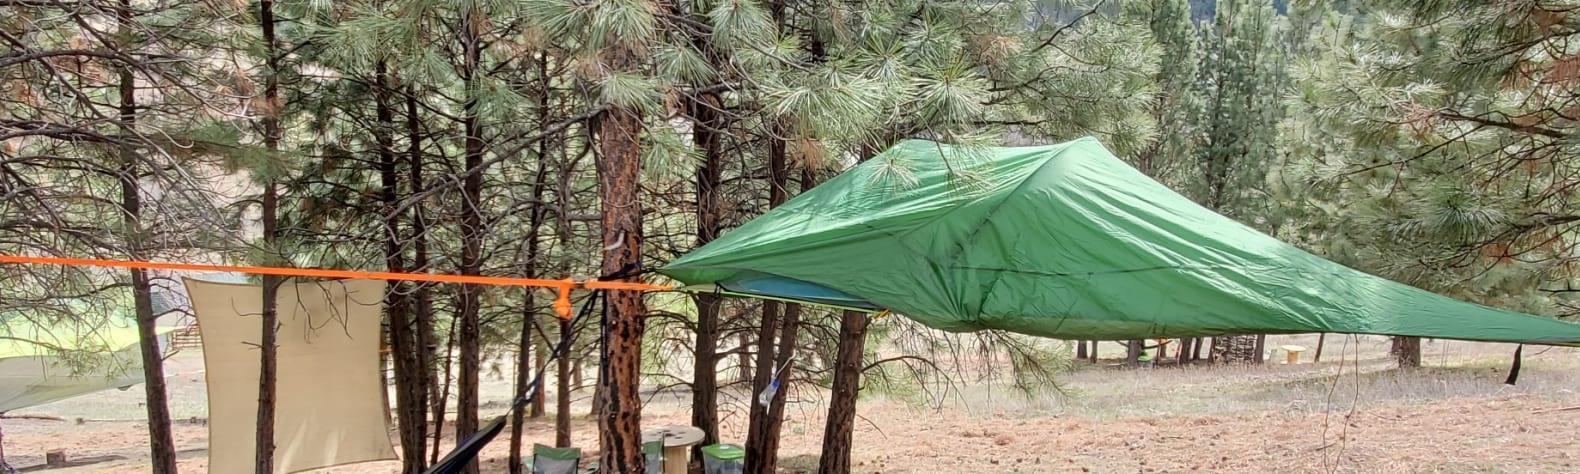 K10 Ranch Tree Tent Experience